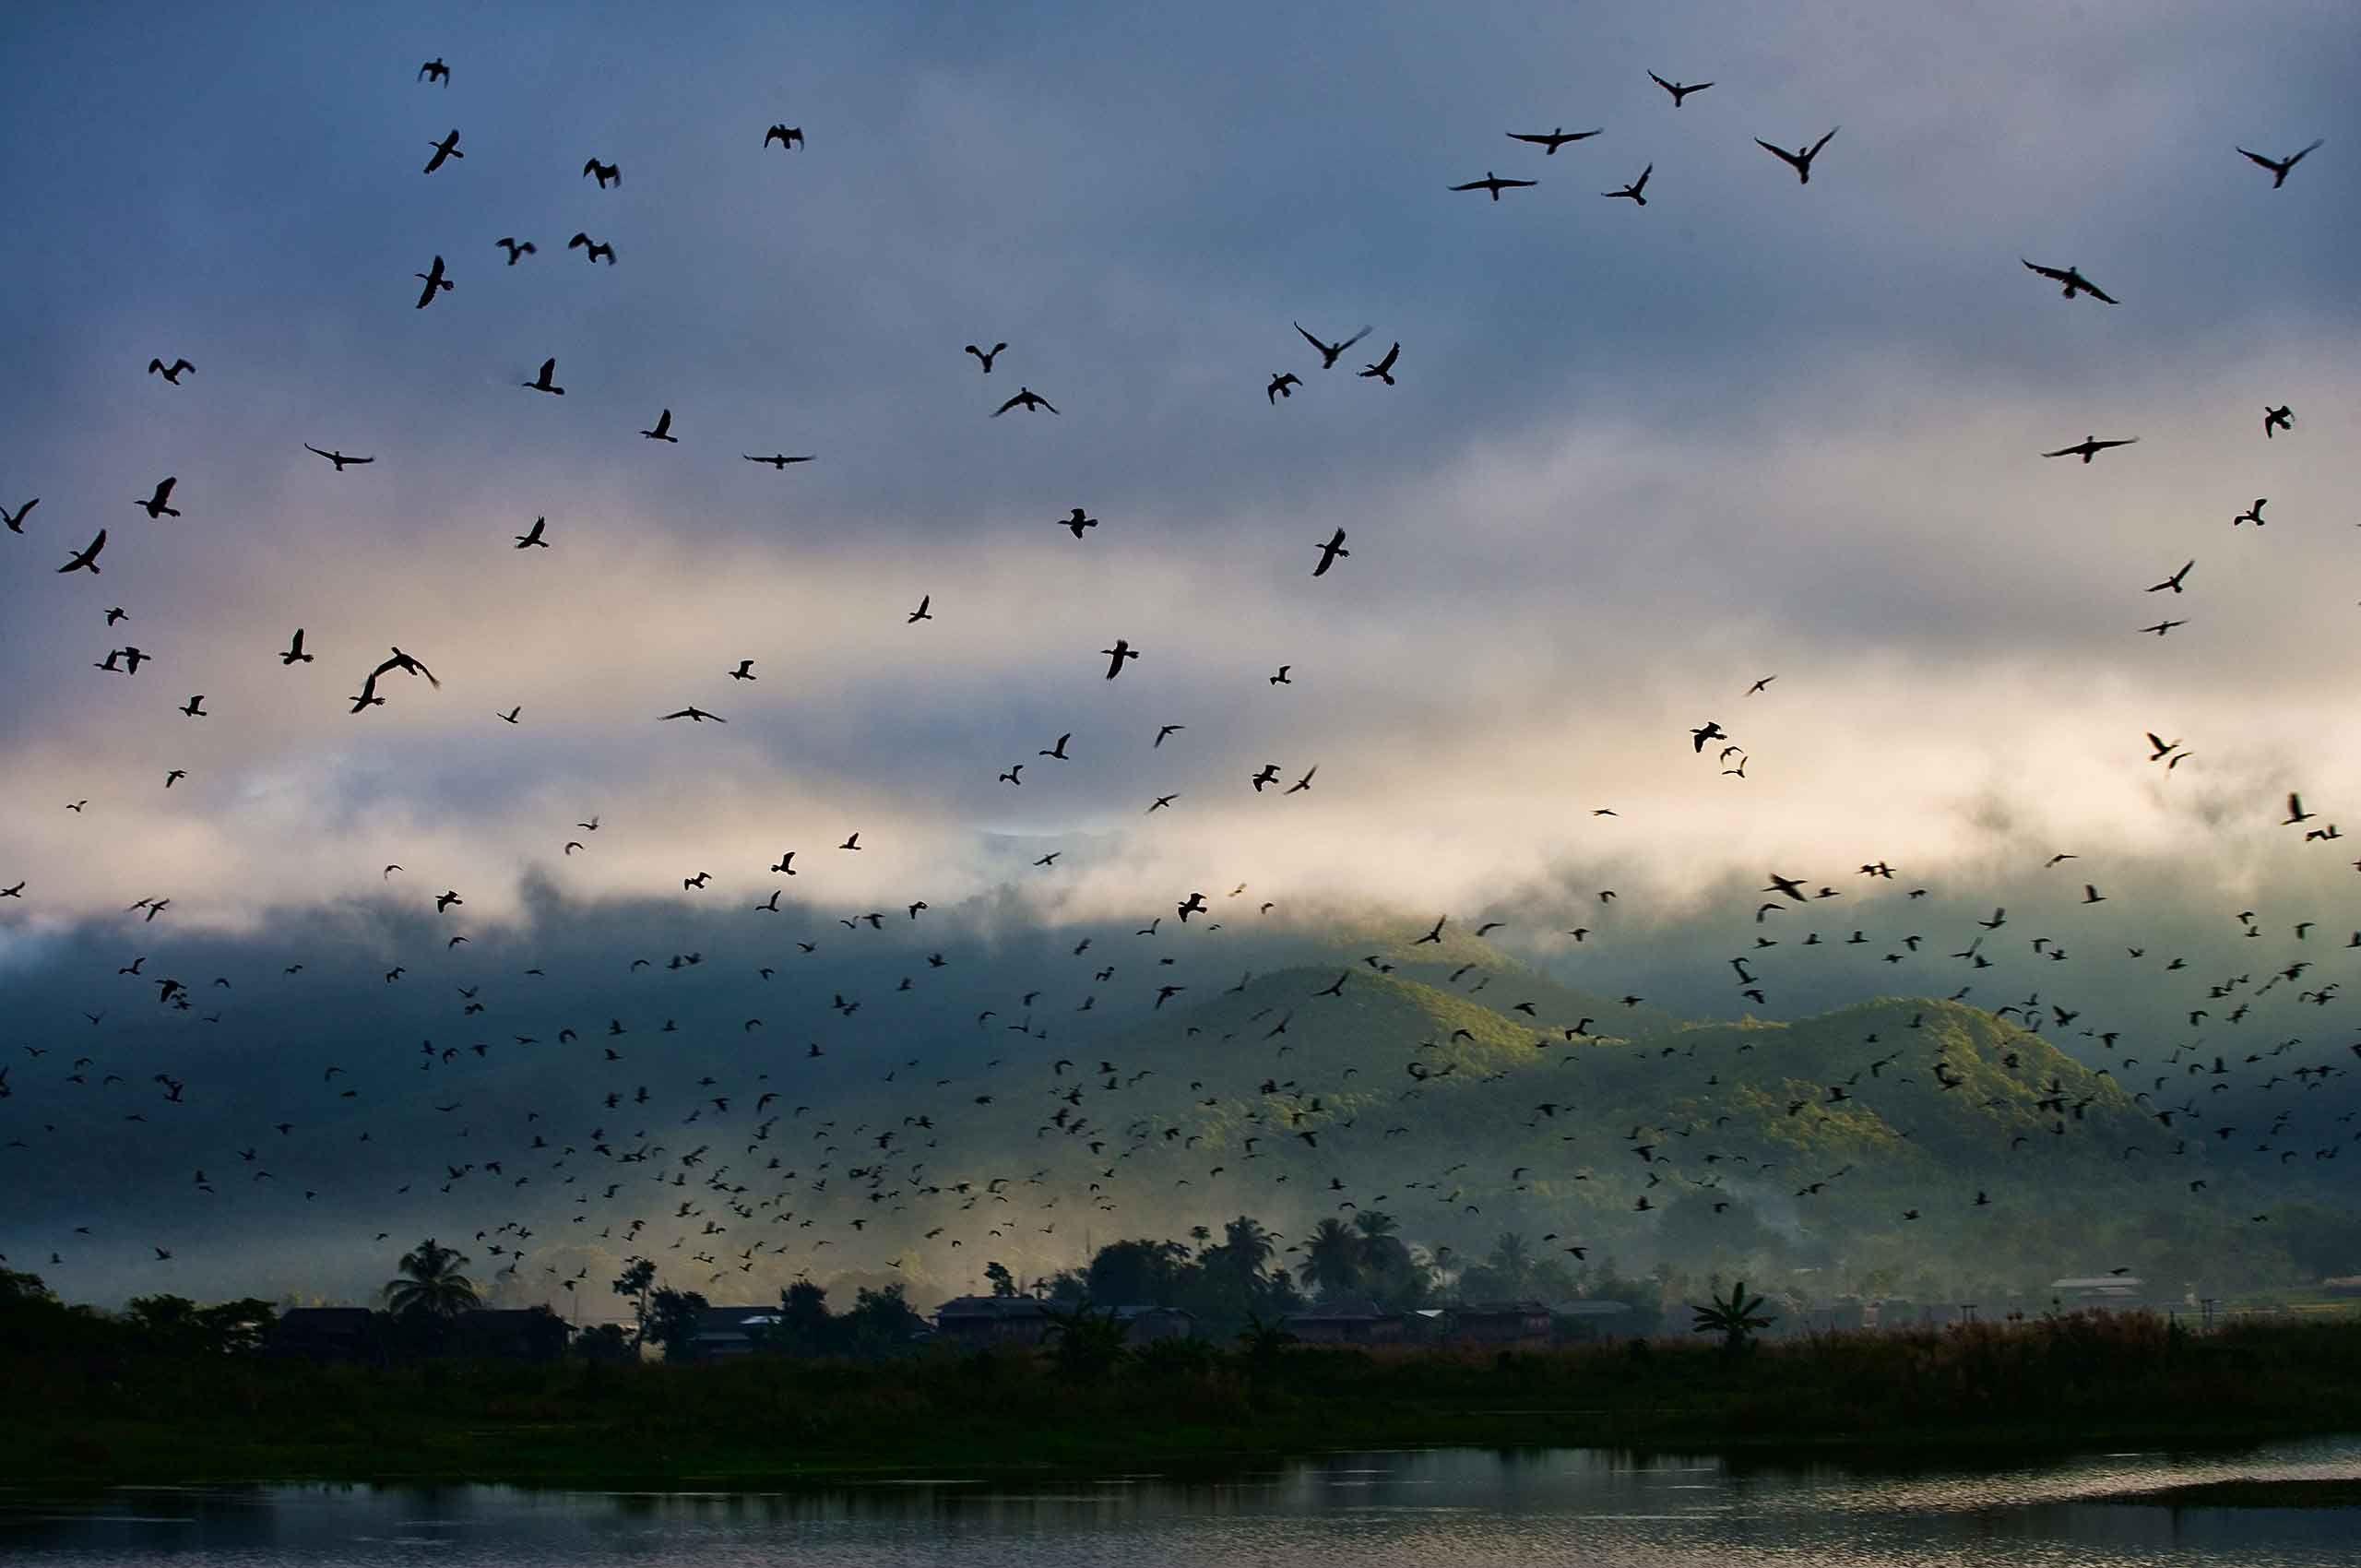 morning-lakeinle-mynmar-by-henrikolundphotography.jpg